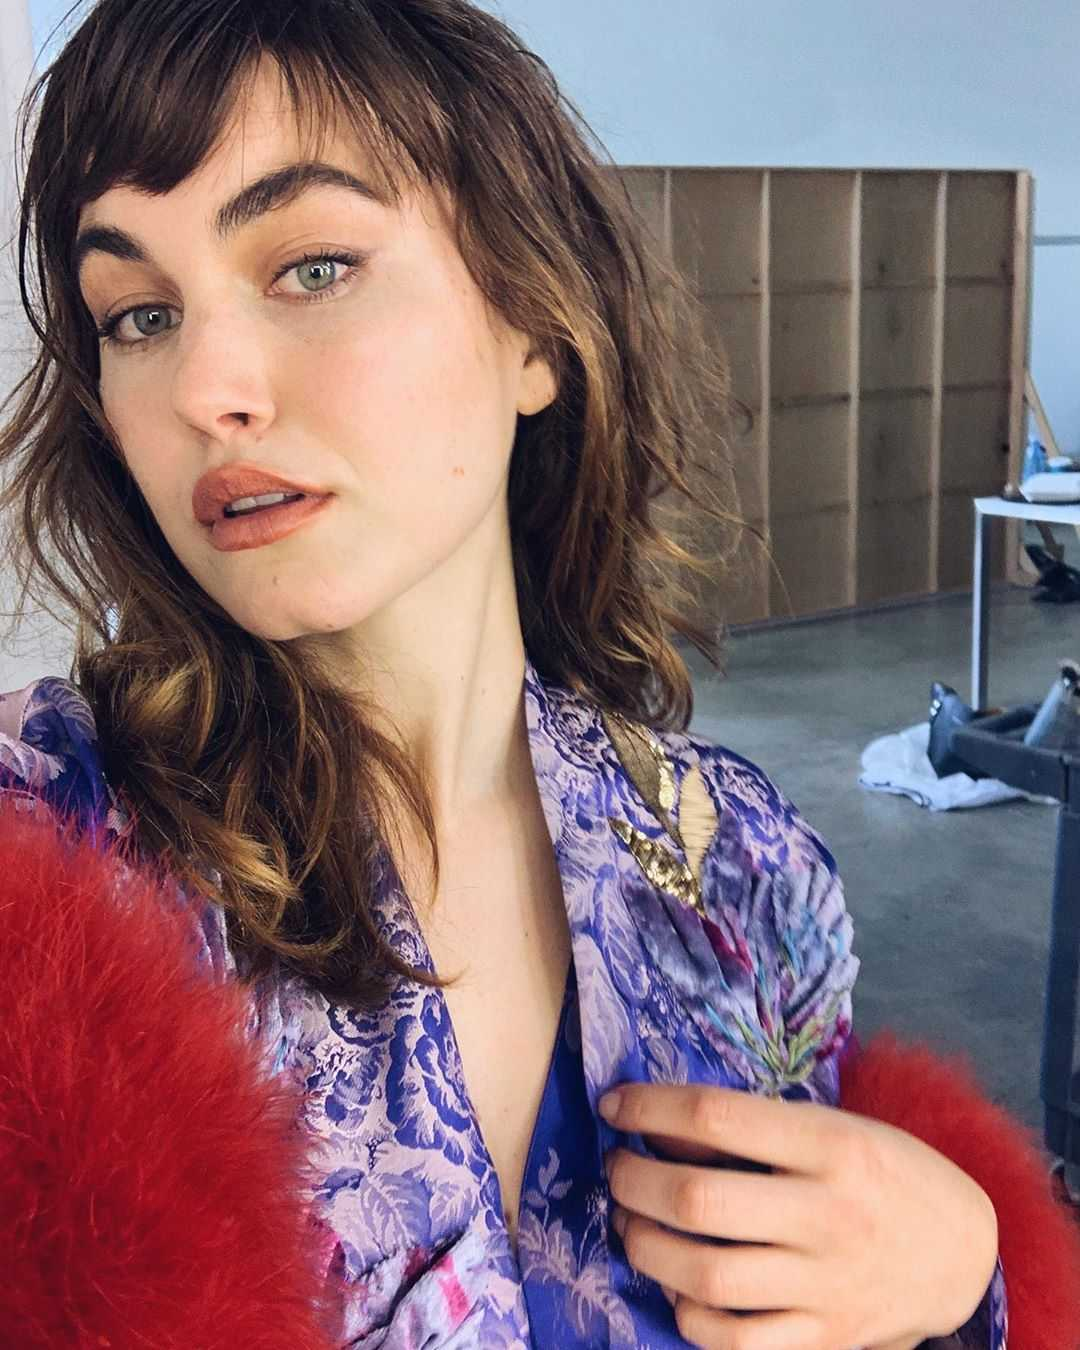 charlotte best cleavage